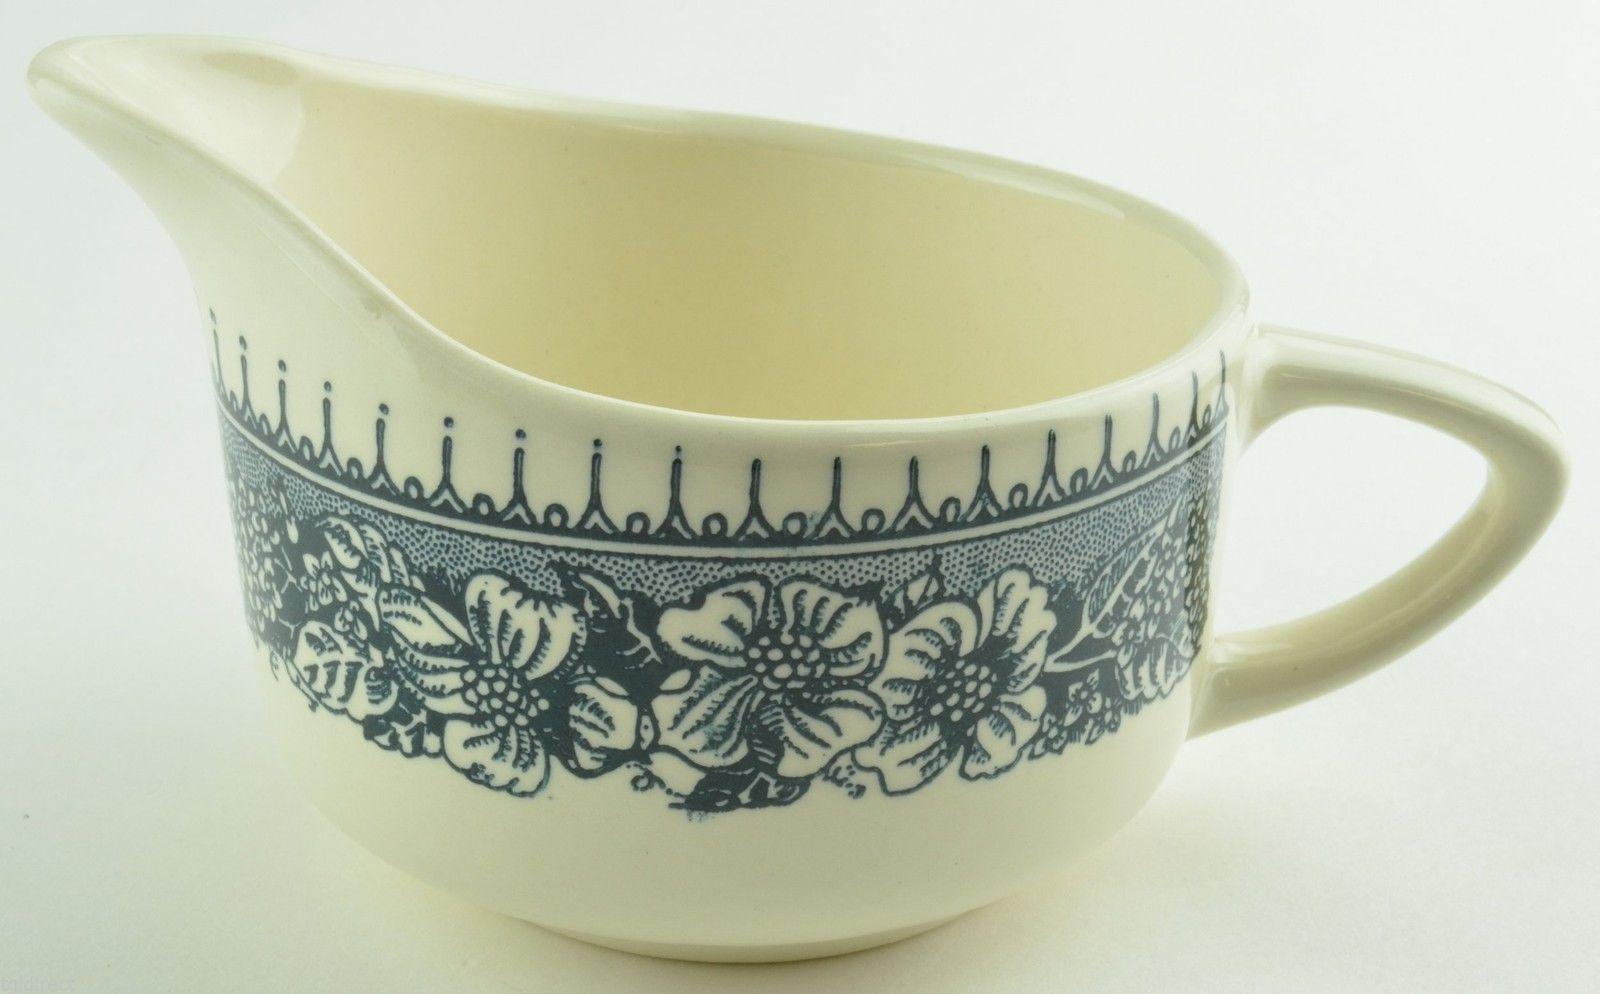 Royal China Colonial Heritage Blue Pattern Creamer USA Stoneware Tableware